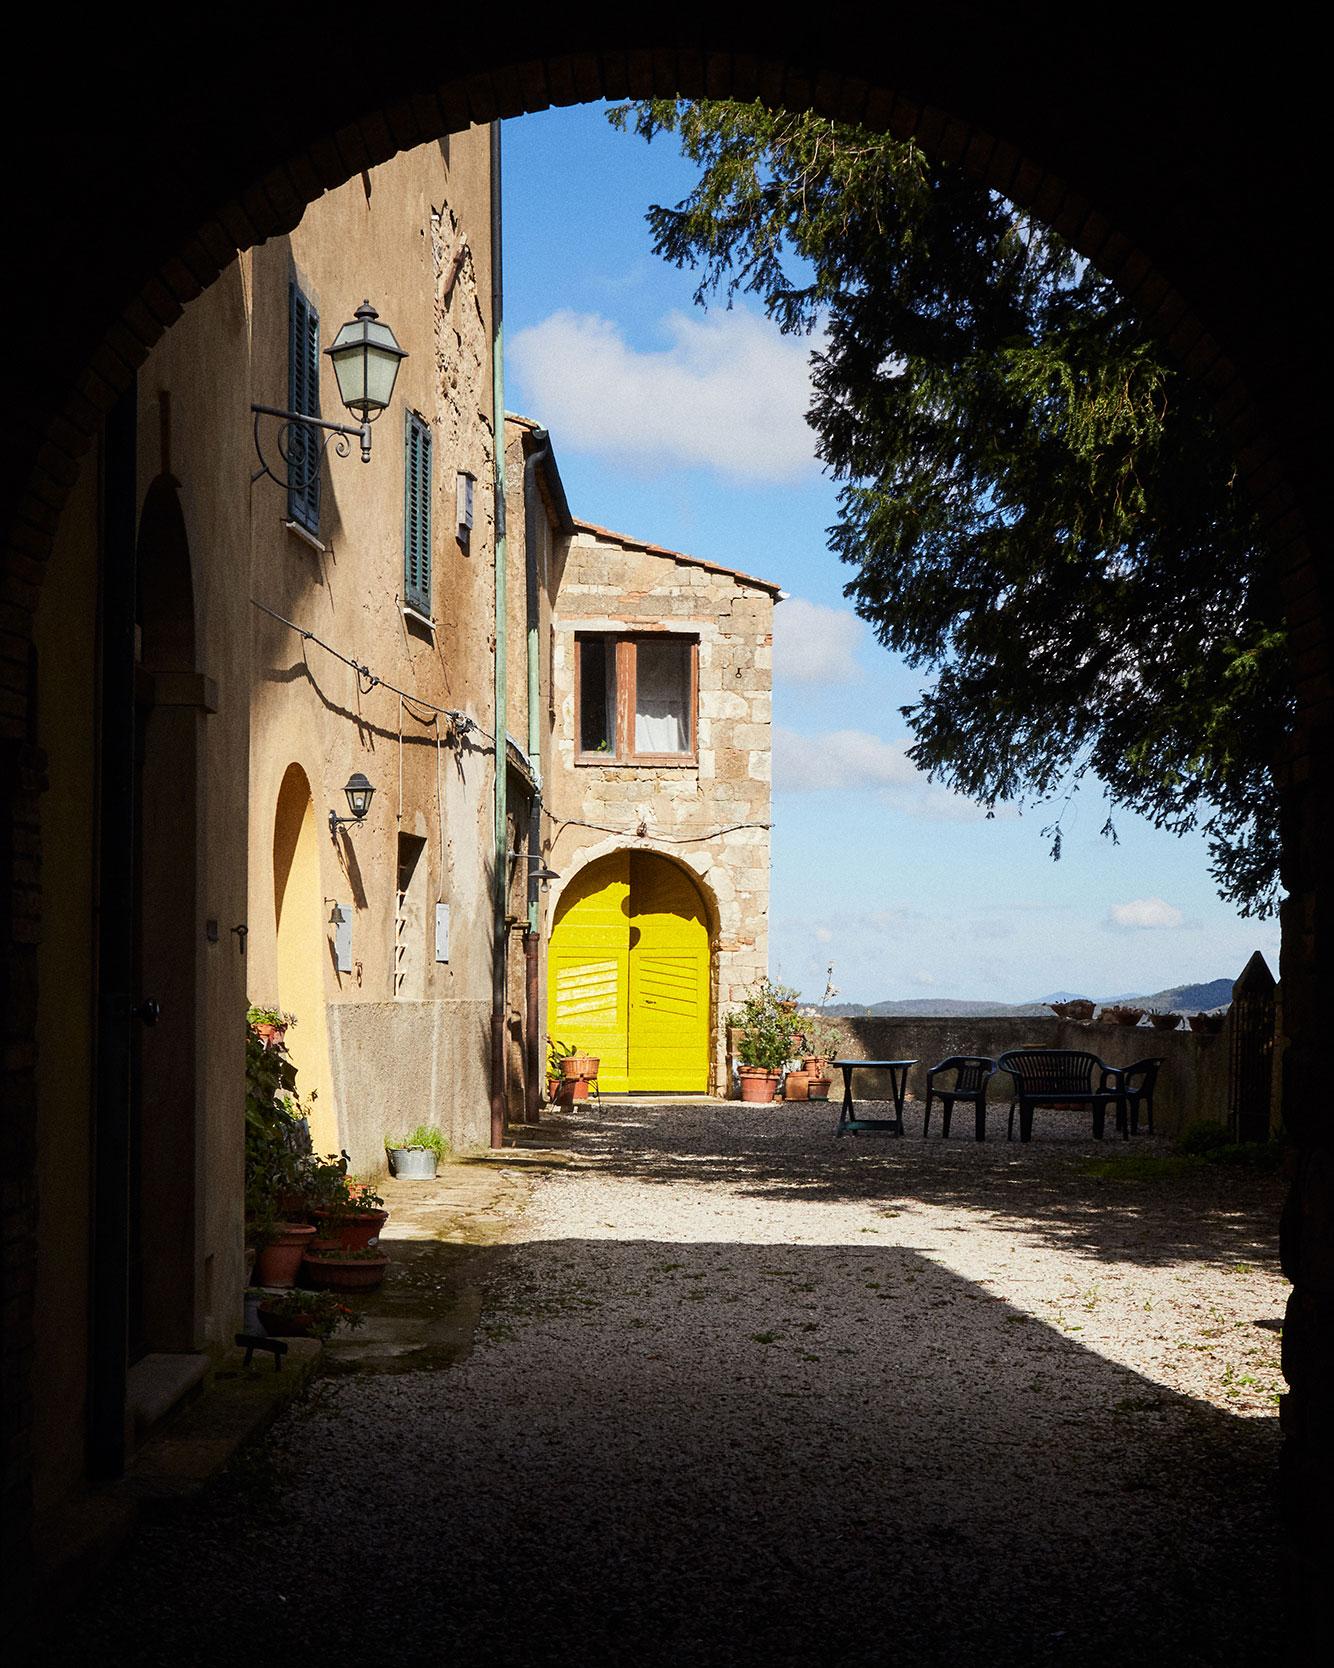 TwoCentsPress-Art-Residency-Tuscany20190410_40.jpg